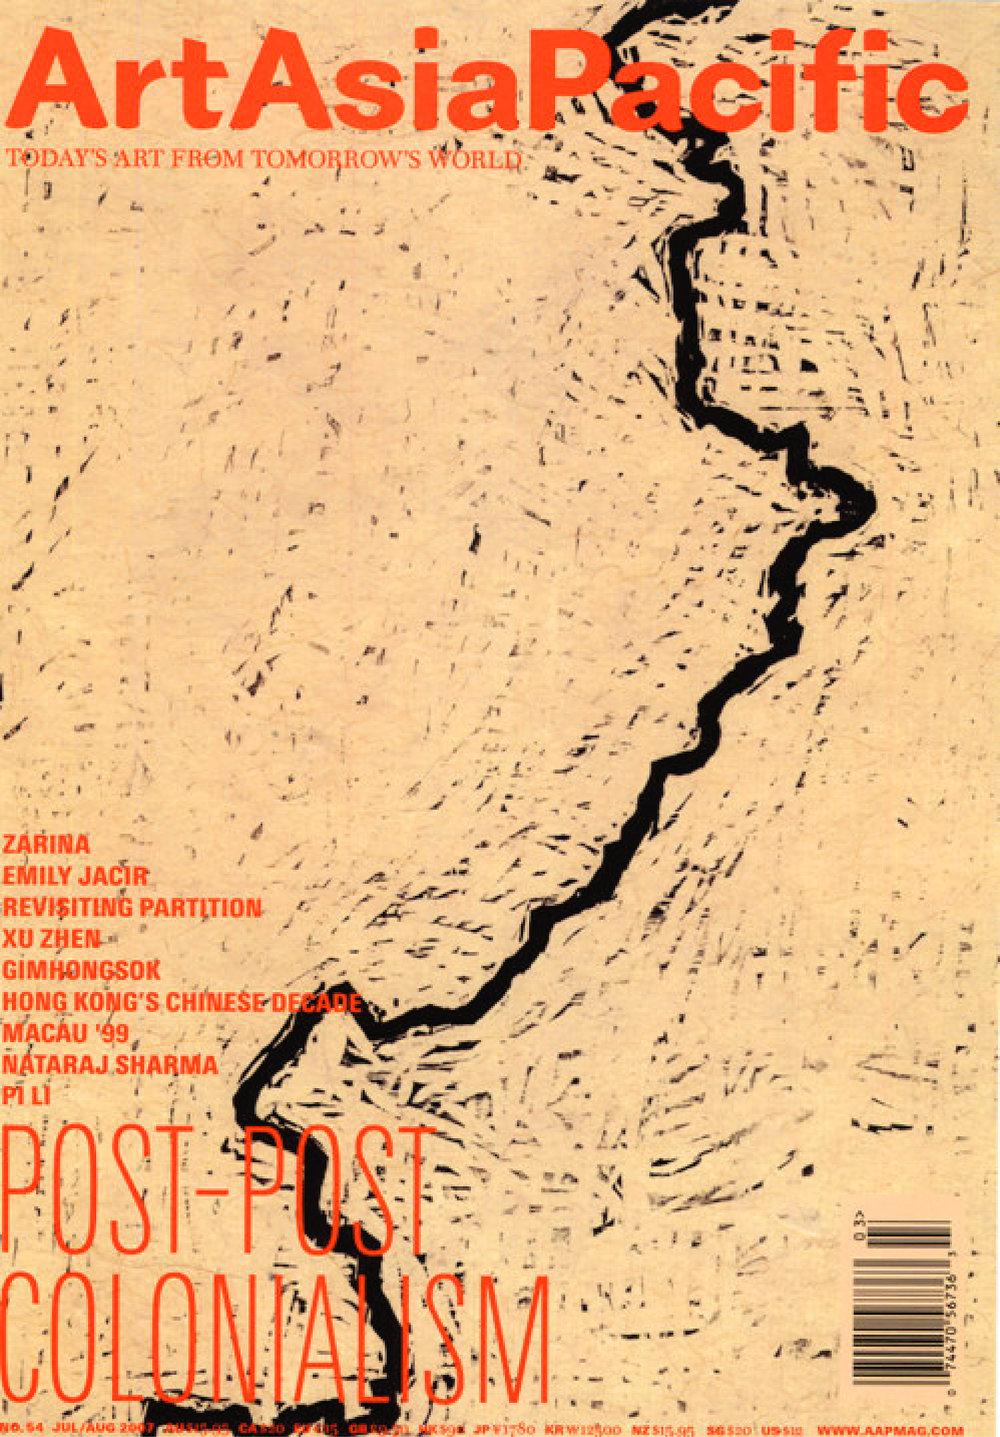 07 ArtAsiaPacific-cover.jpg